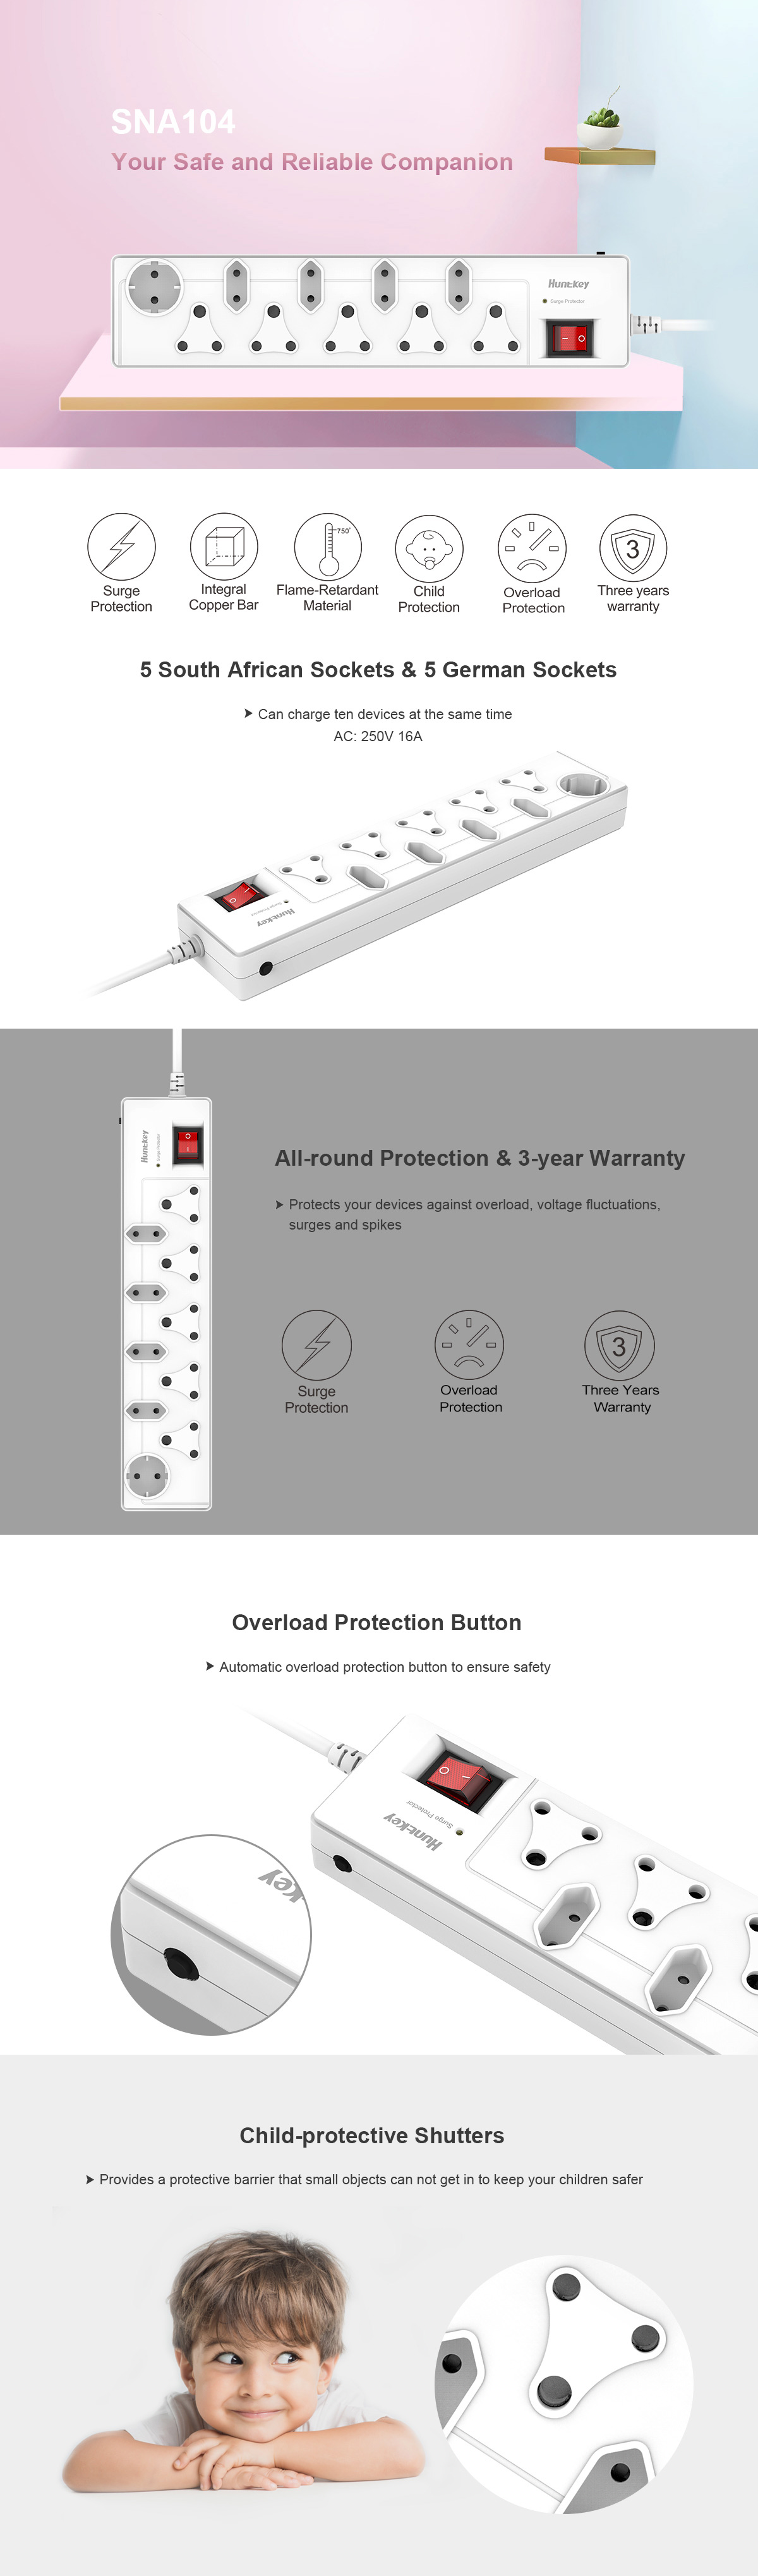 surge-protector-16 SNA104